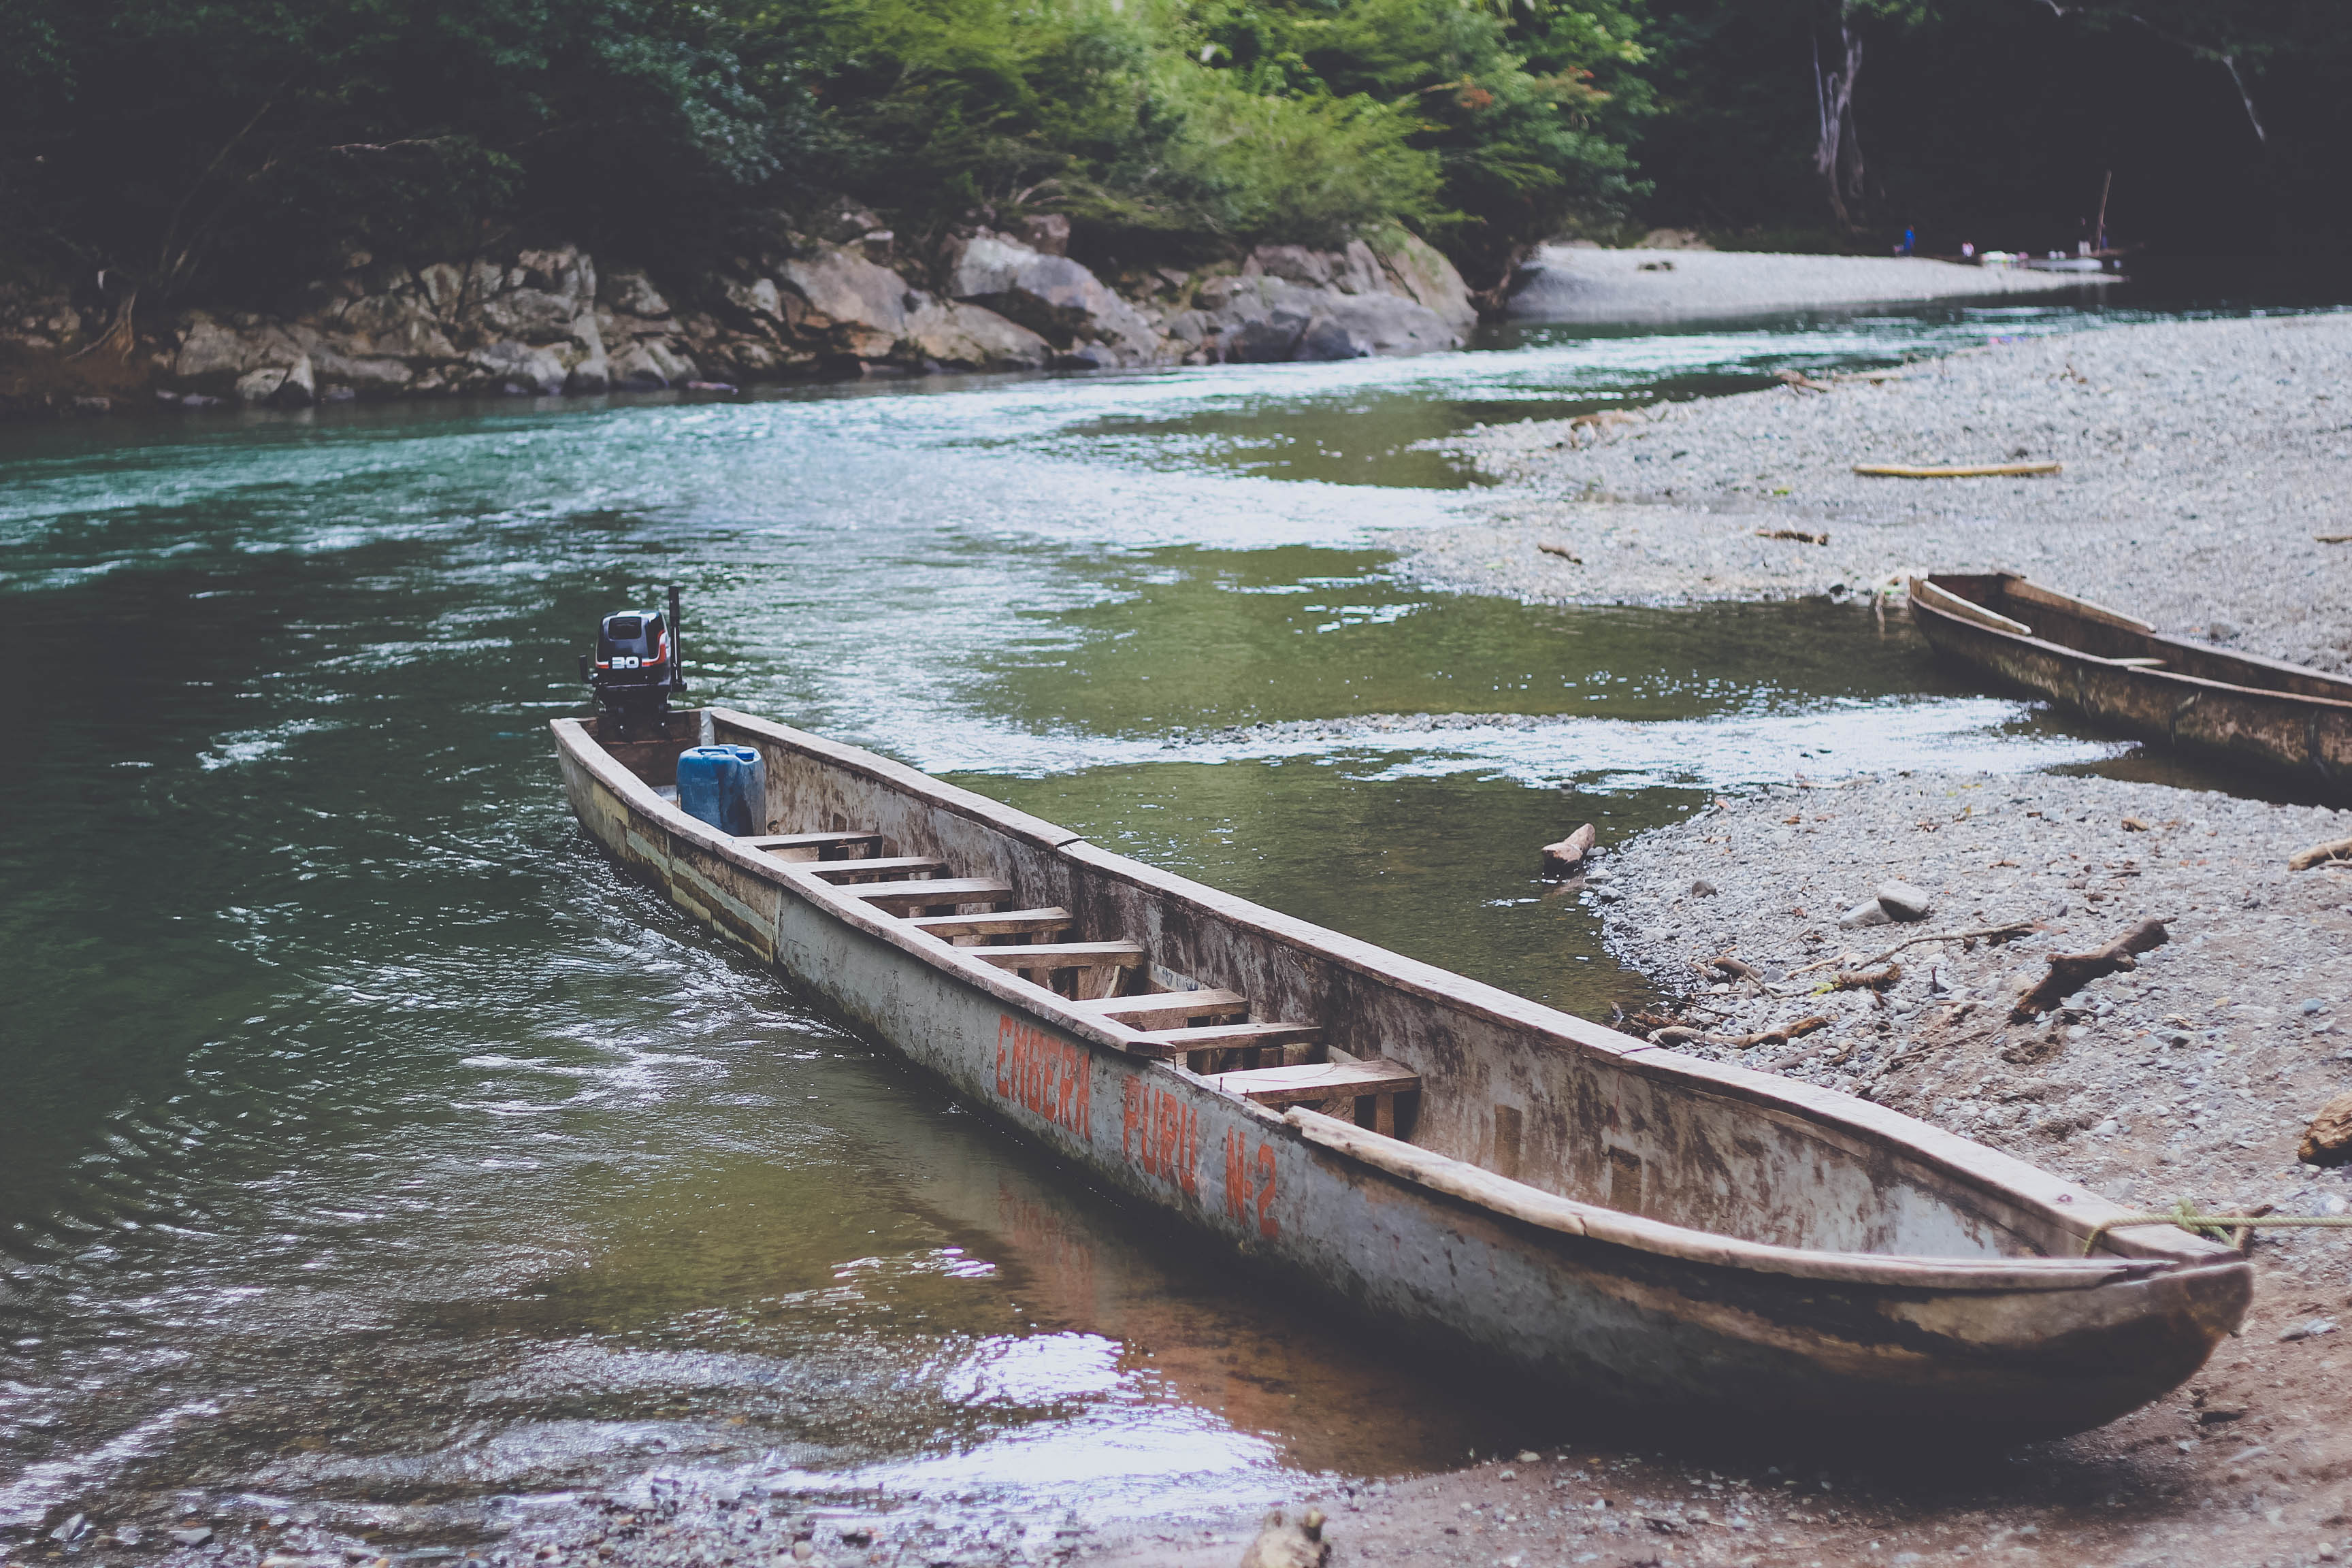 Canoe on Muddy Riverbank, Boat, Boating, Canoe, Mud, HQ Photo